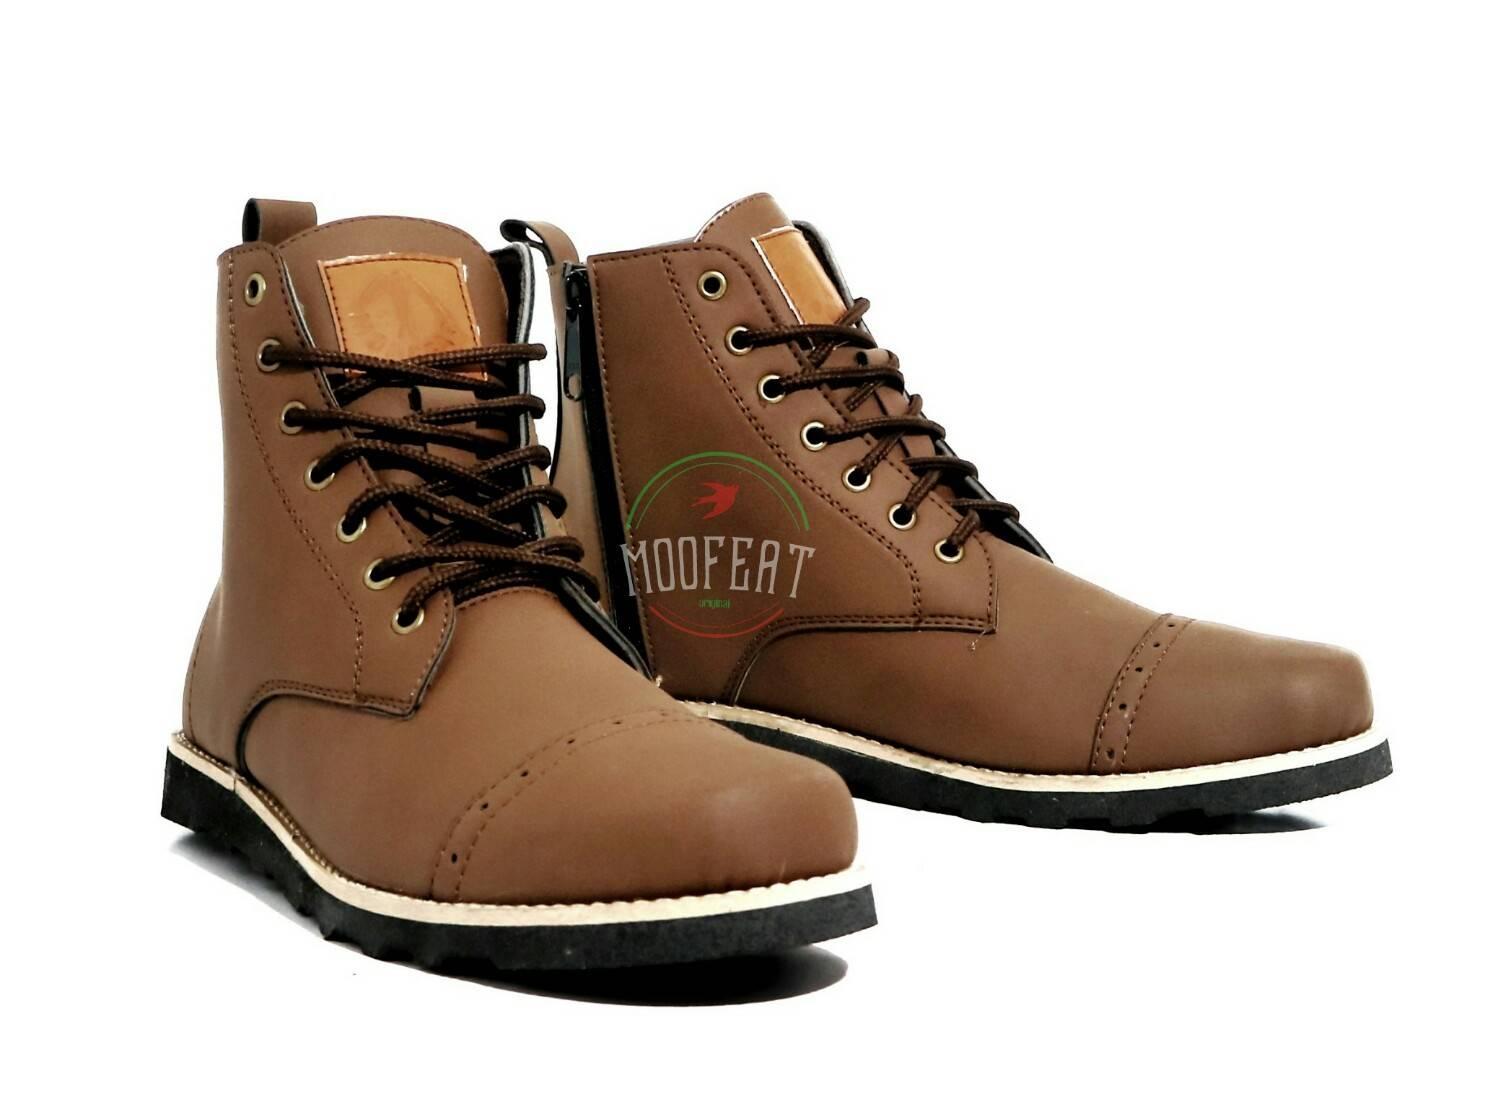 Sepatu Boots Zipper Original Moofeat Sued casual Slop Loafers sneakers nike adidas boots sekolah anak formal kets slip on slop loafers sandal kerja proyek safety shoes dinas santai kickers puma caterpillar kuliah pria dan wanita